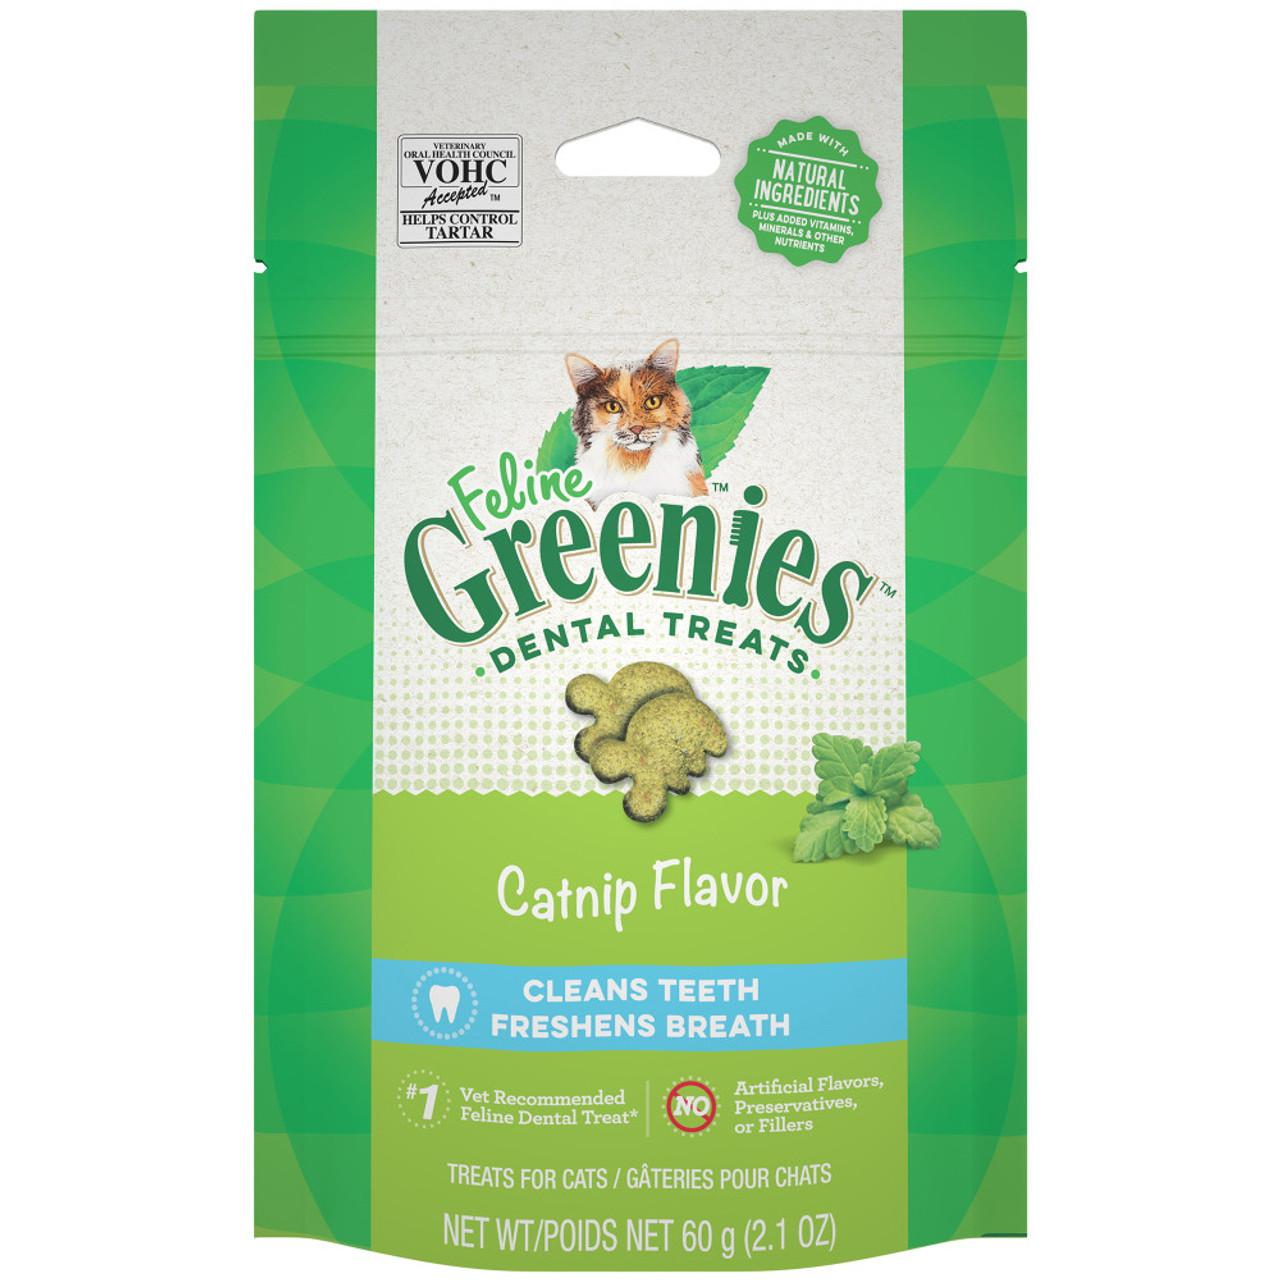 Feline Greenies Catnip Flavor Cat Dental Treats